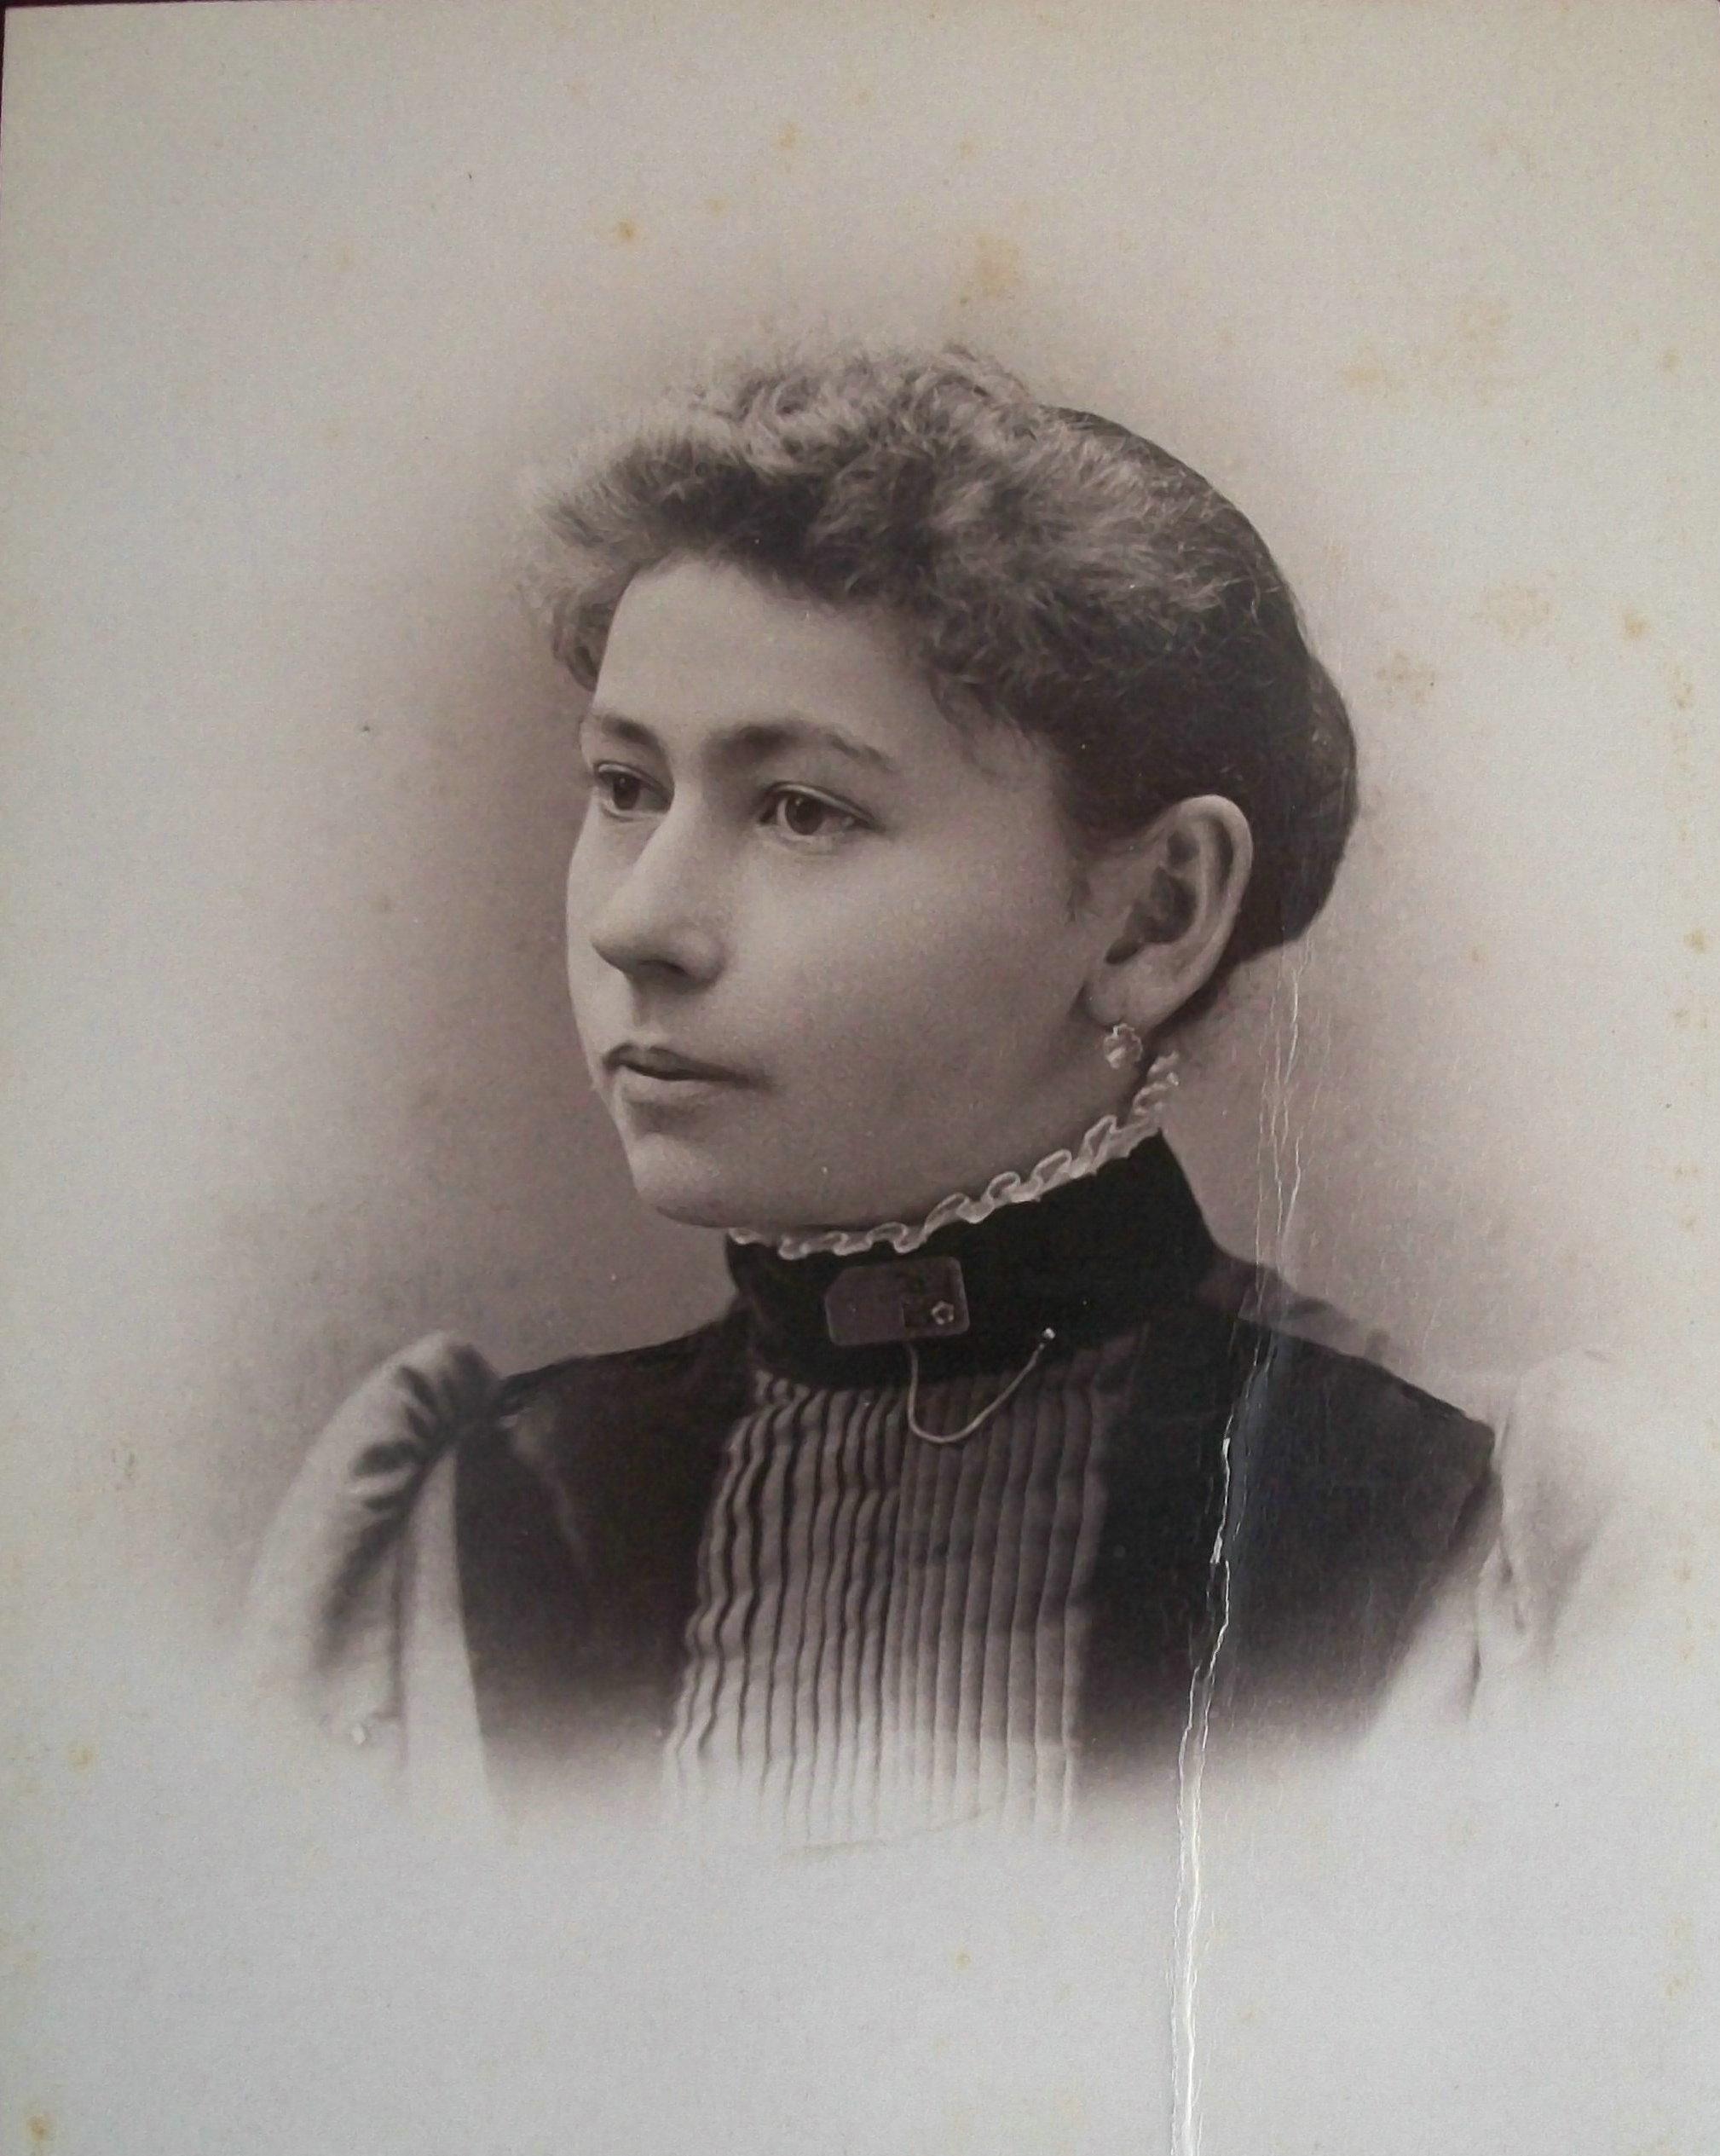 Sarah Schwey